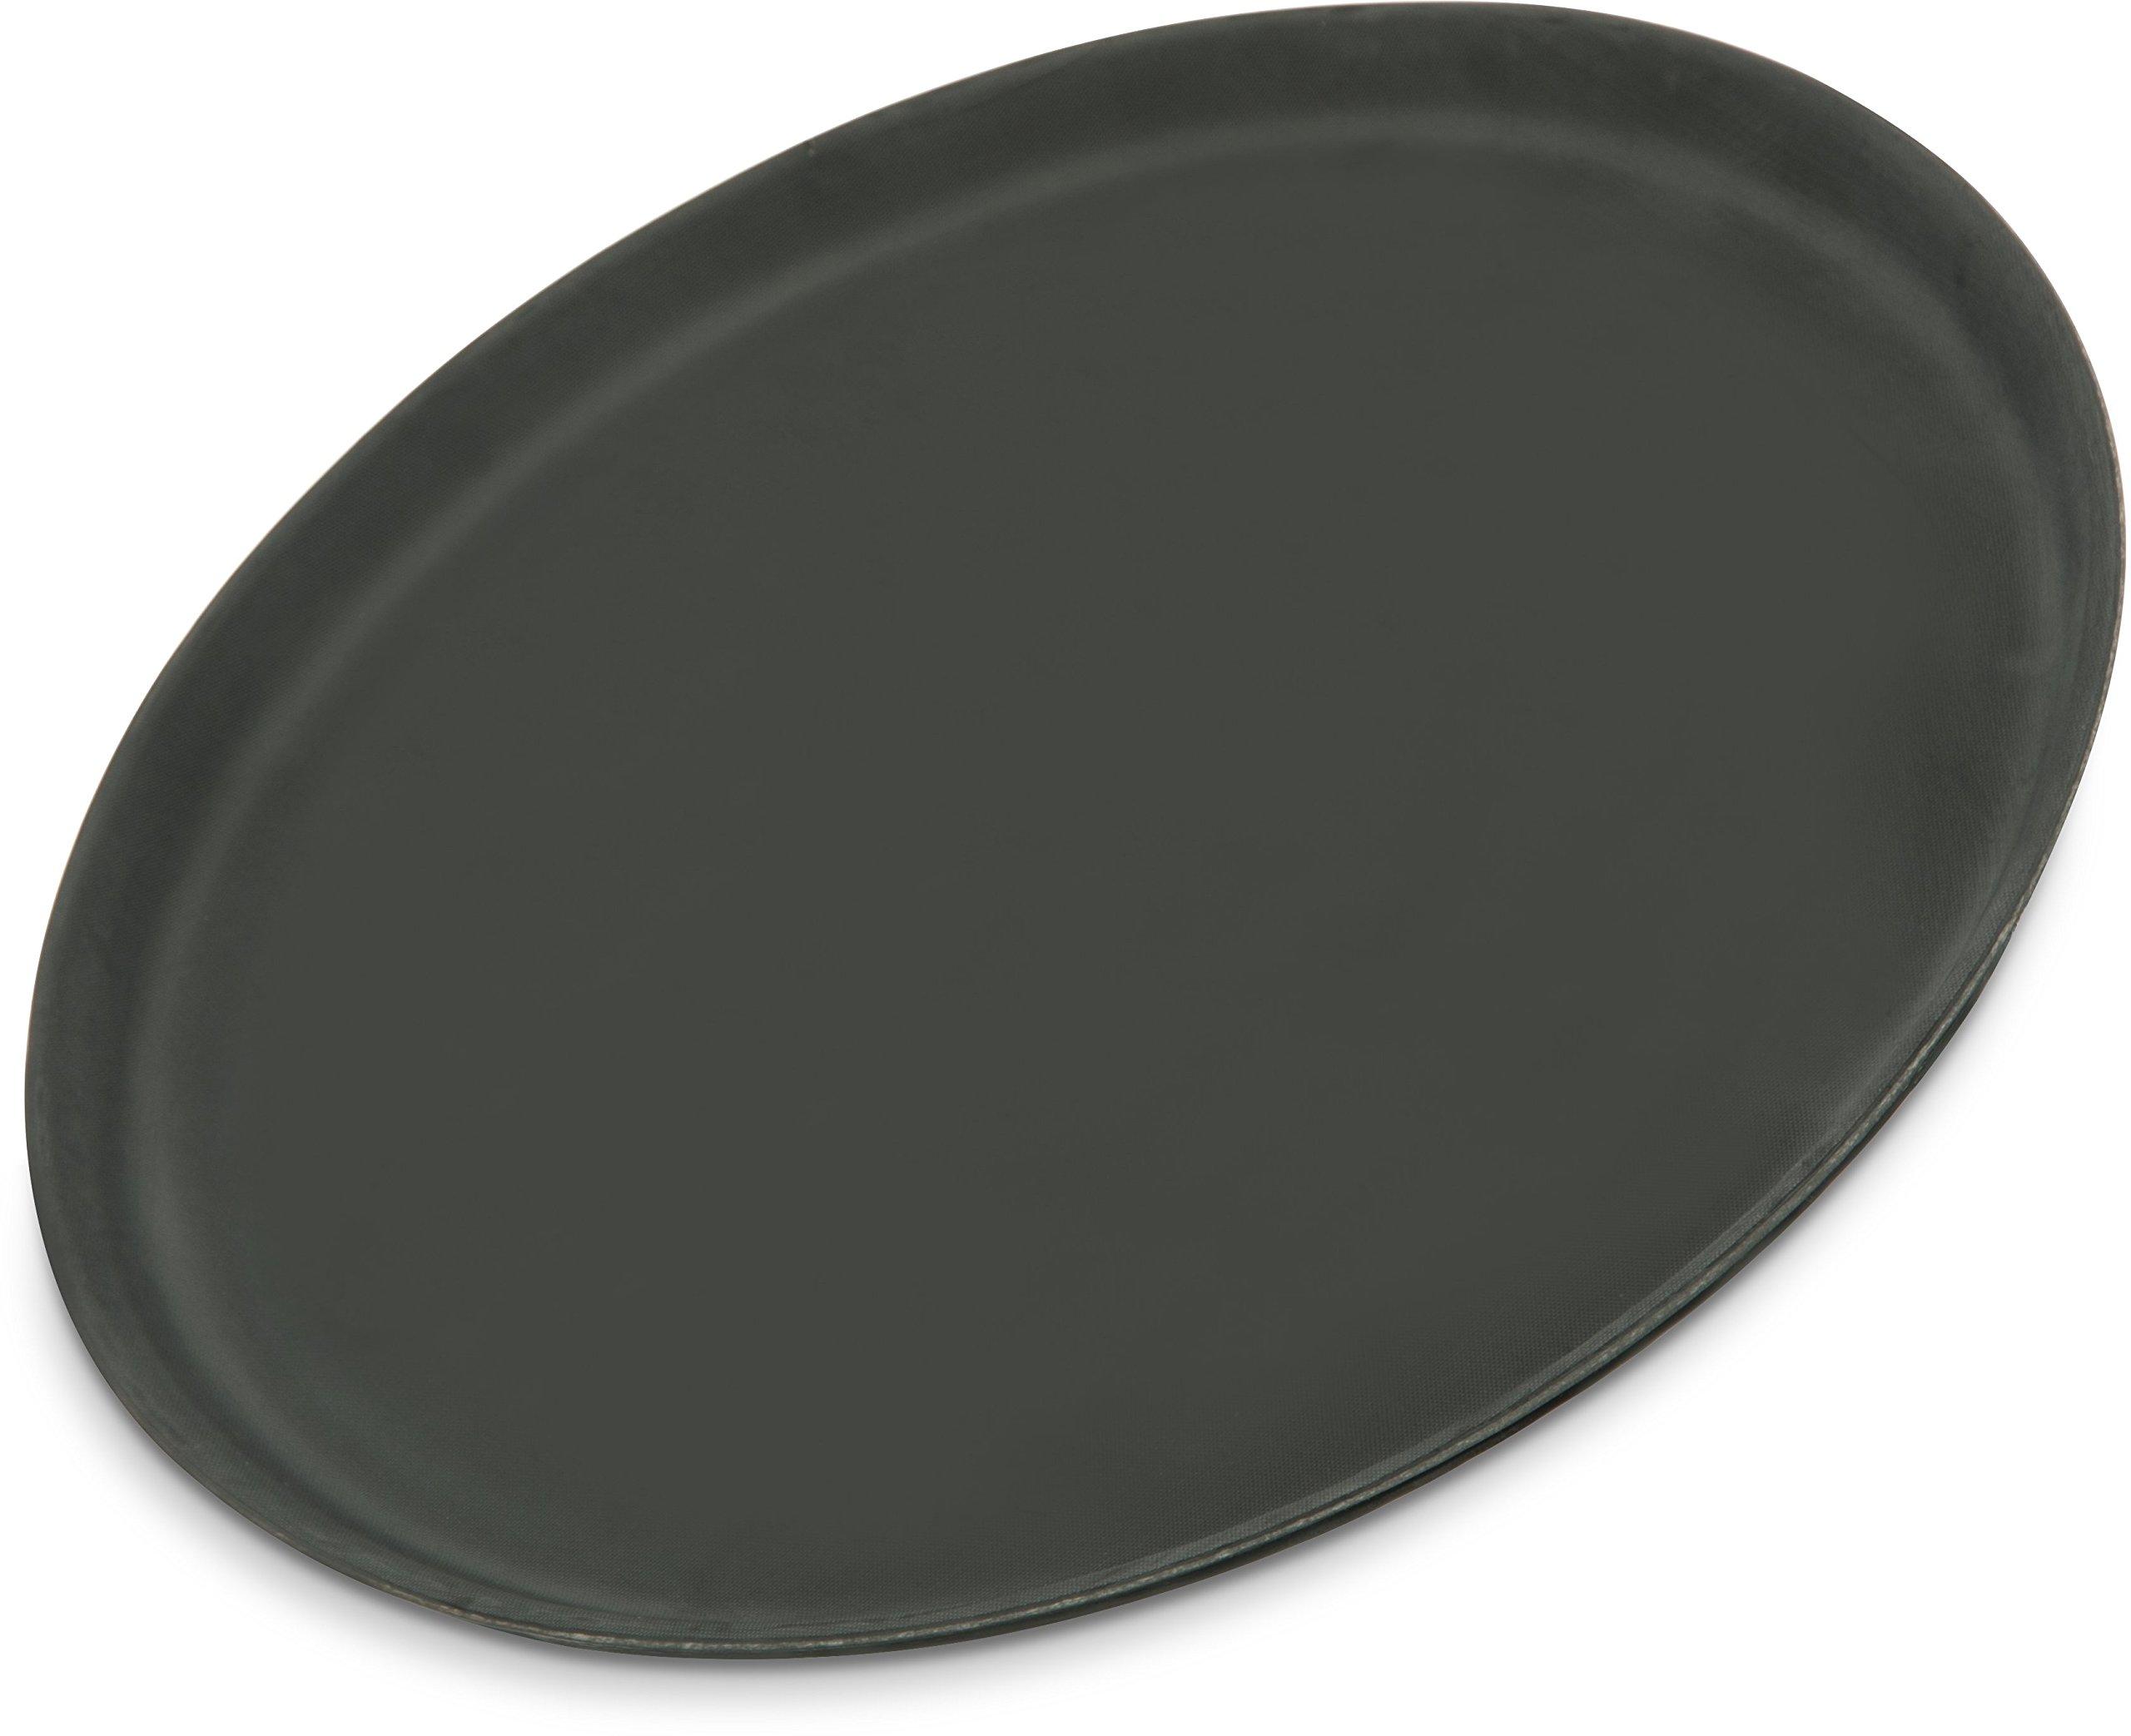 Carlisle 1400GR004 Griptite Rubber Lined Non-Slip Round Serving Tray, 14'' Diameter, Black (Pack of 12)